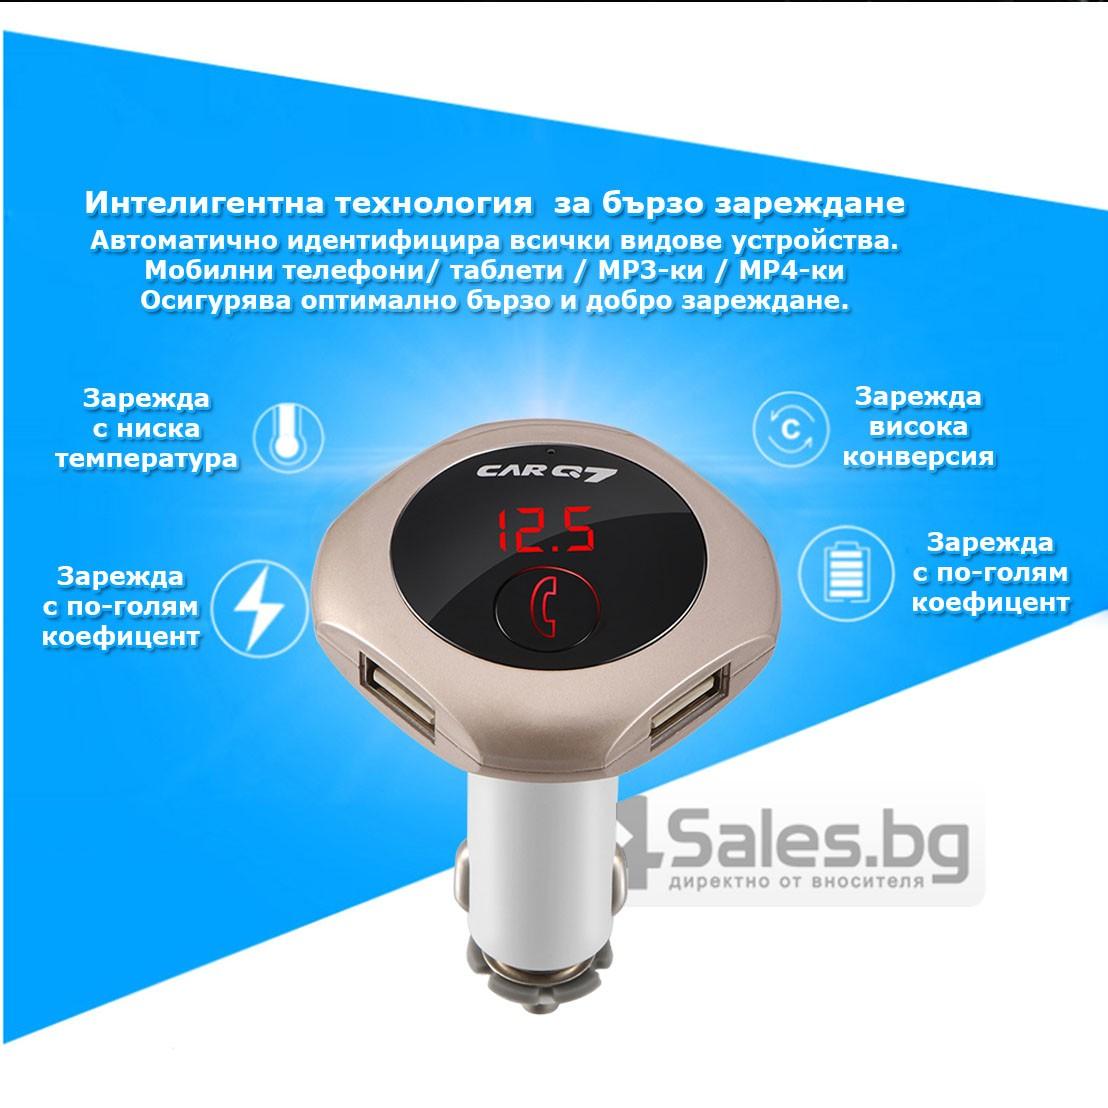 Wireless FM трансмитер CAR Q7 с Bluetooth, 2 USB, дигитален дисплей, MP3 HF5 18